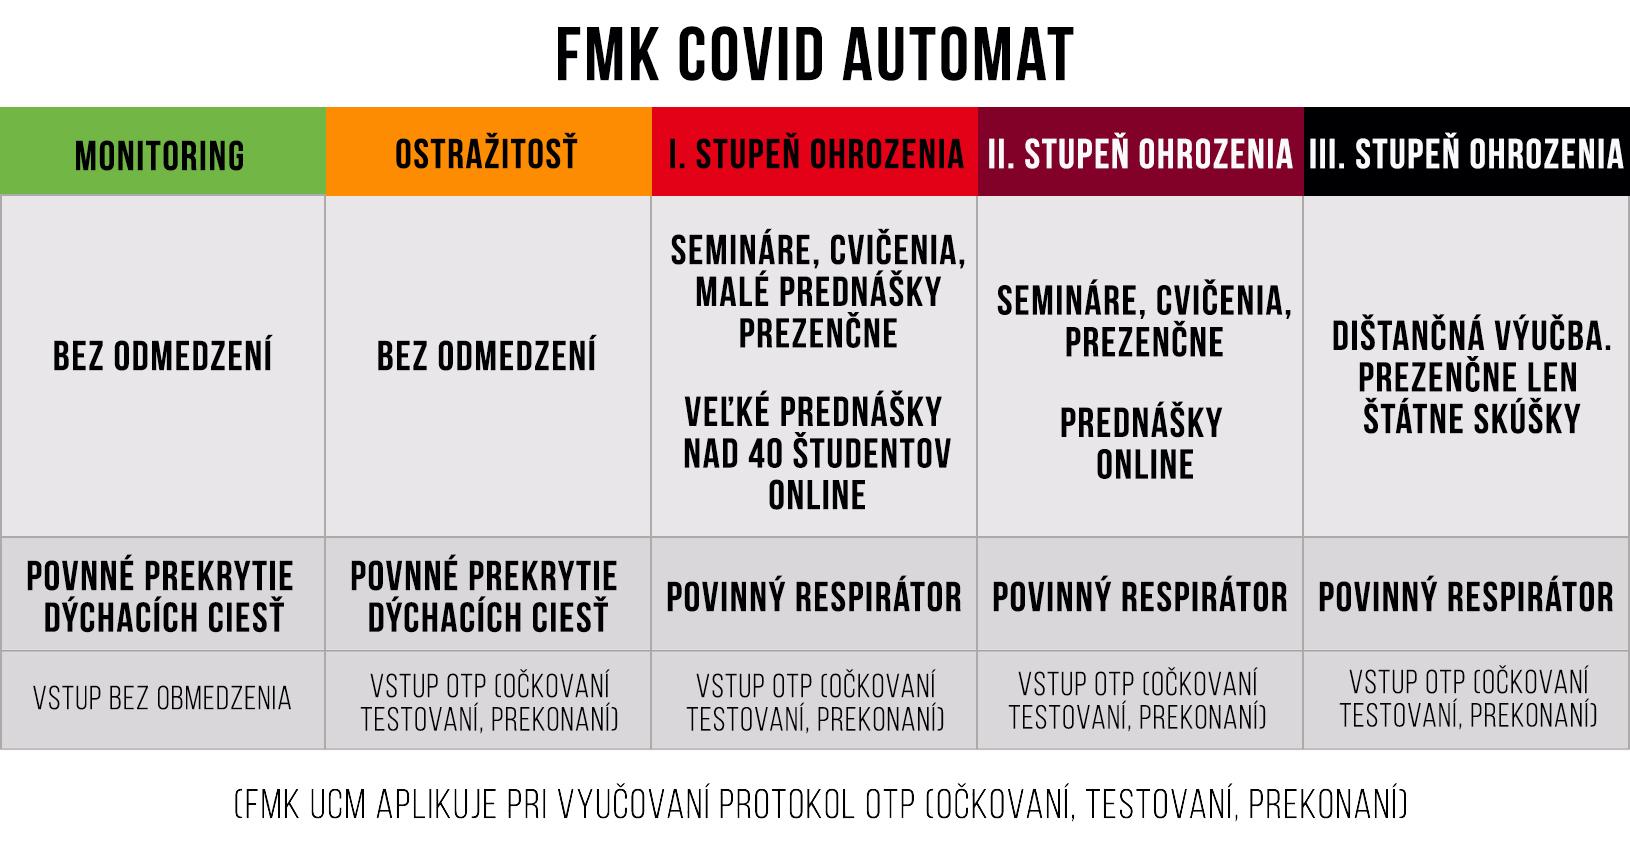 fmk covid automat 02